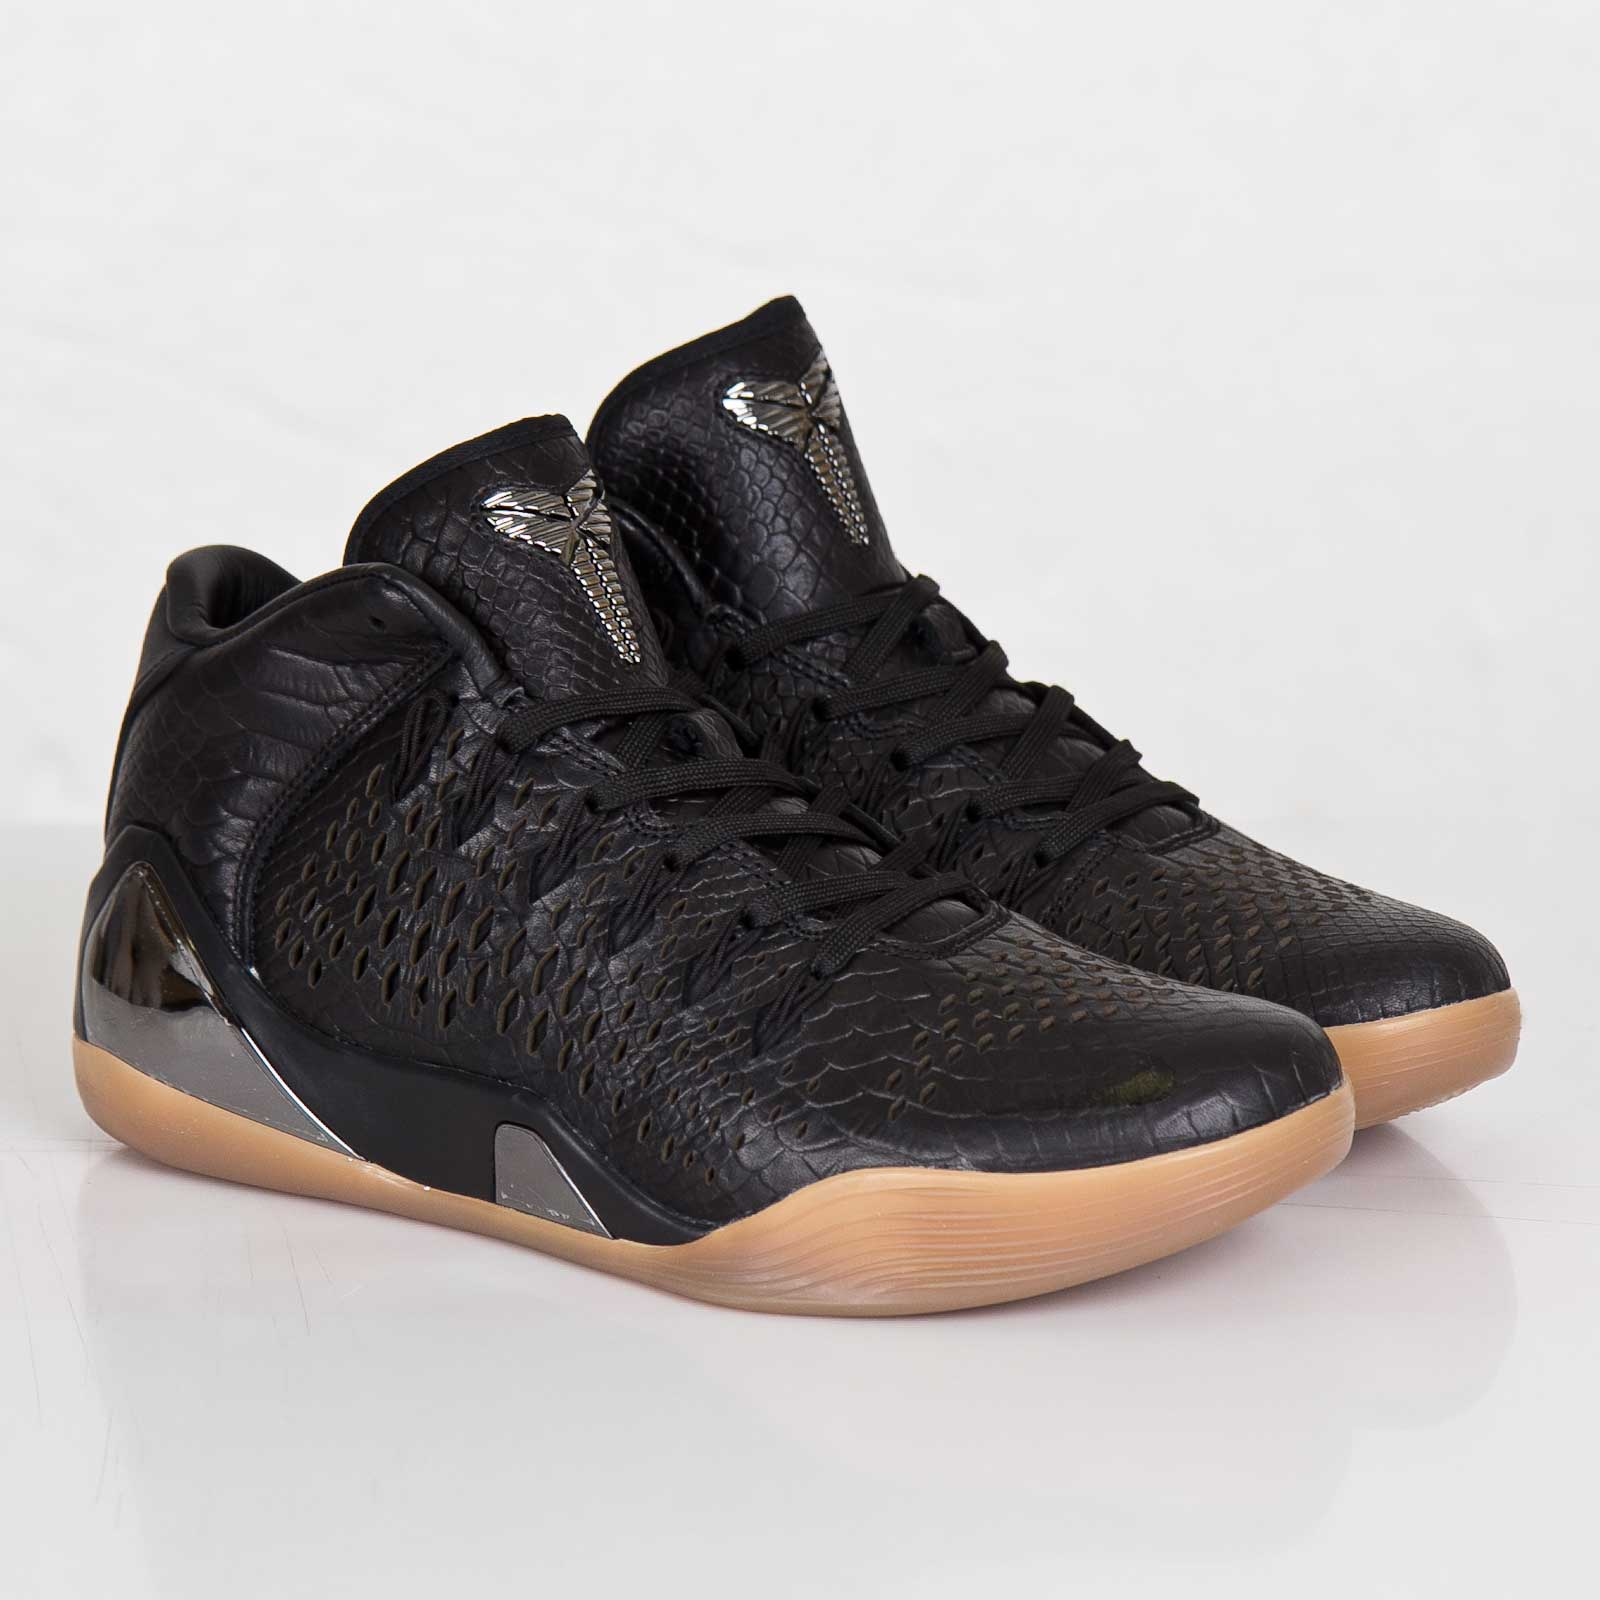 sale retailer 3dcc6 7cb9b Nike Kobe IX Mid EXT QS